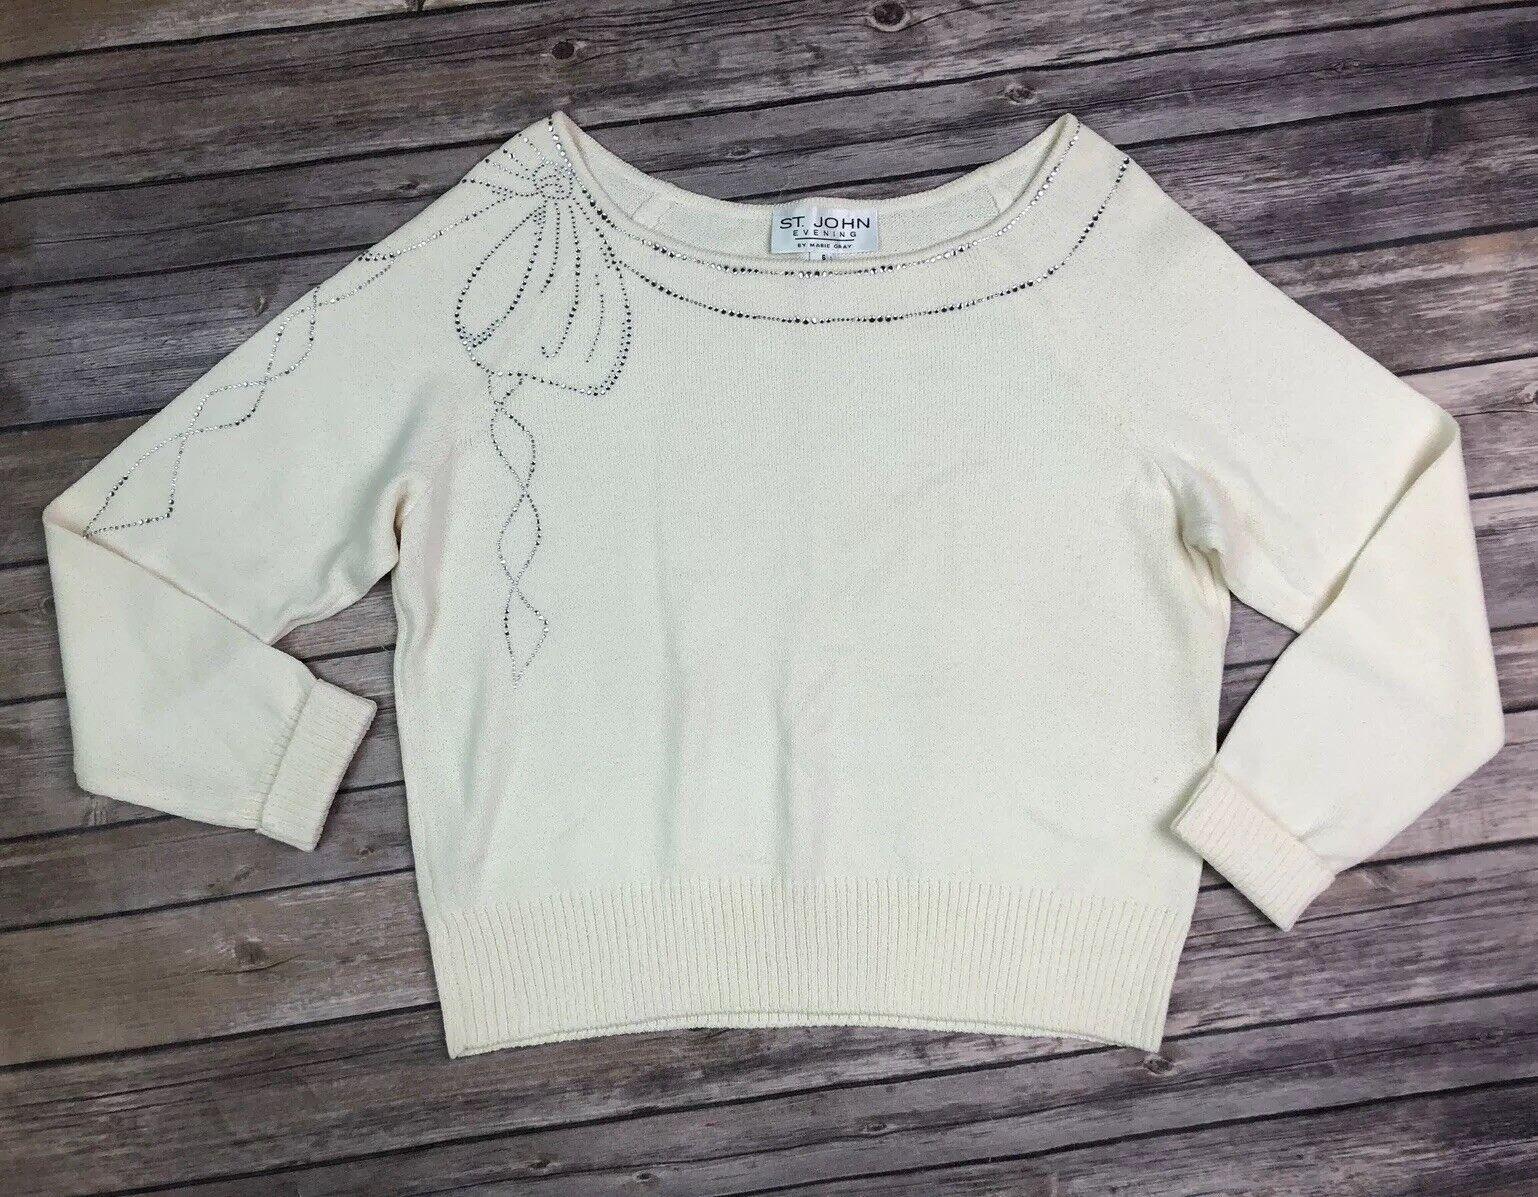 St. John Evening 6 Cream Rhinestone Studded Bow Santanna Knit Sweater Top